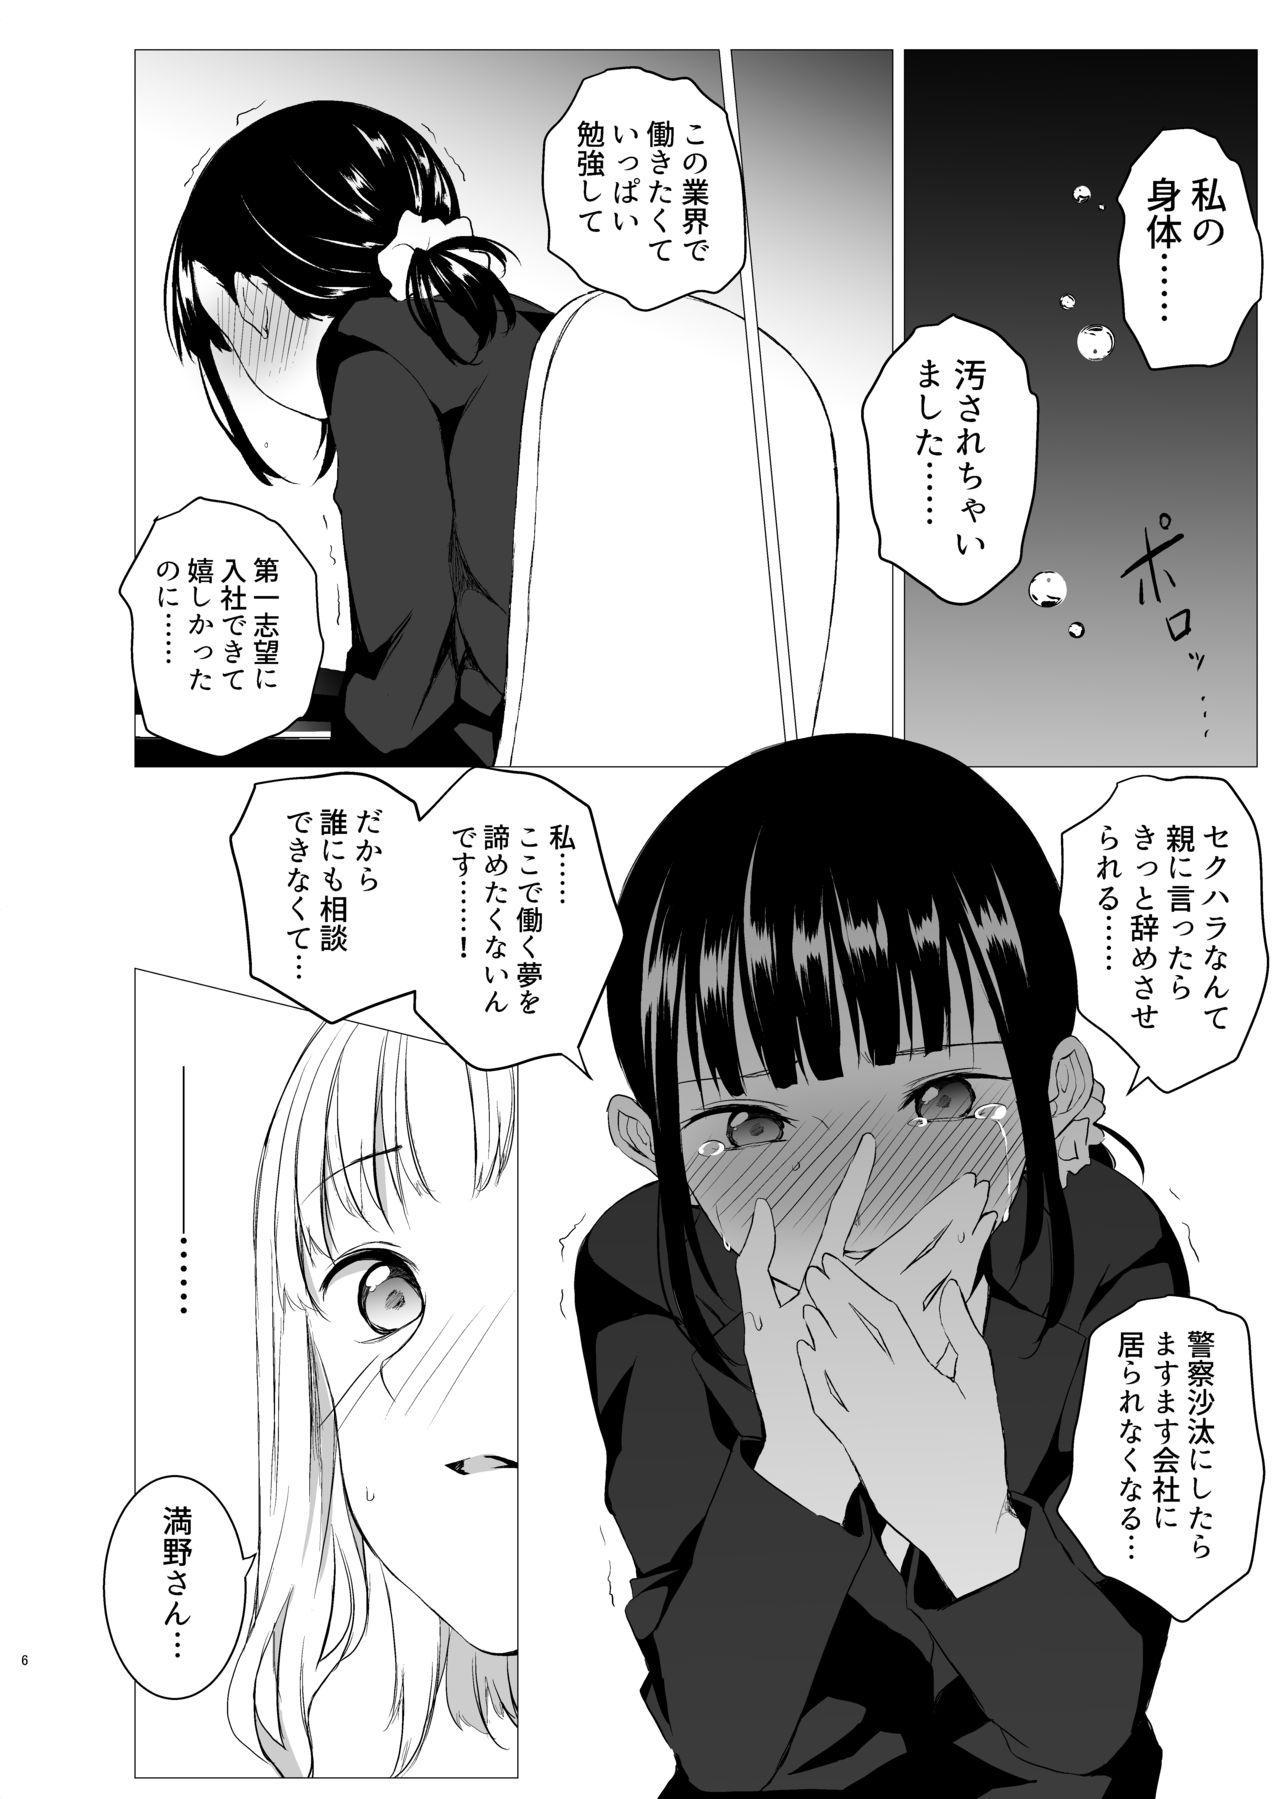 Hanayomi no Makurakotoba 4